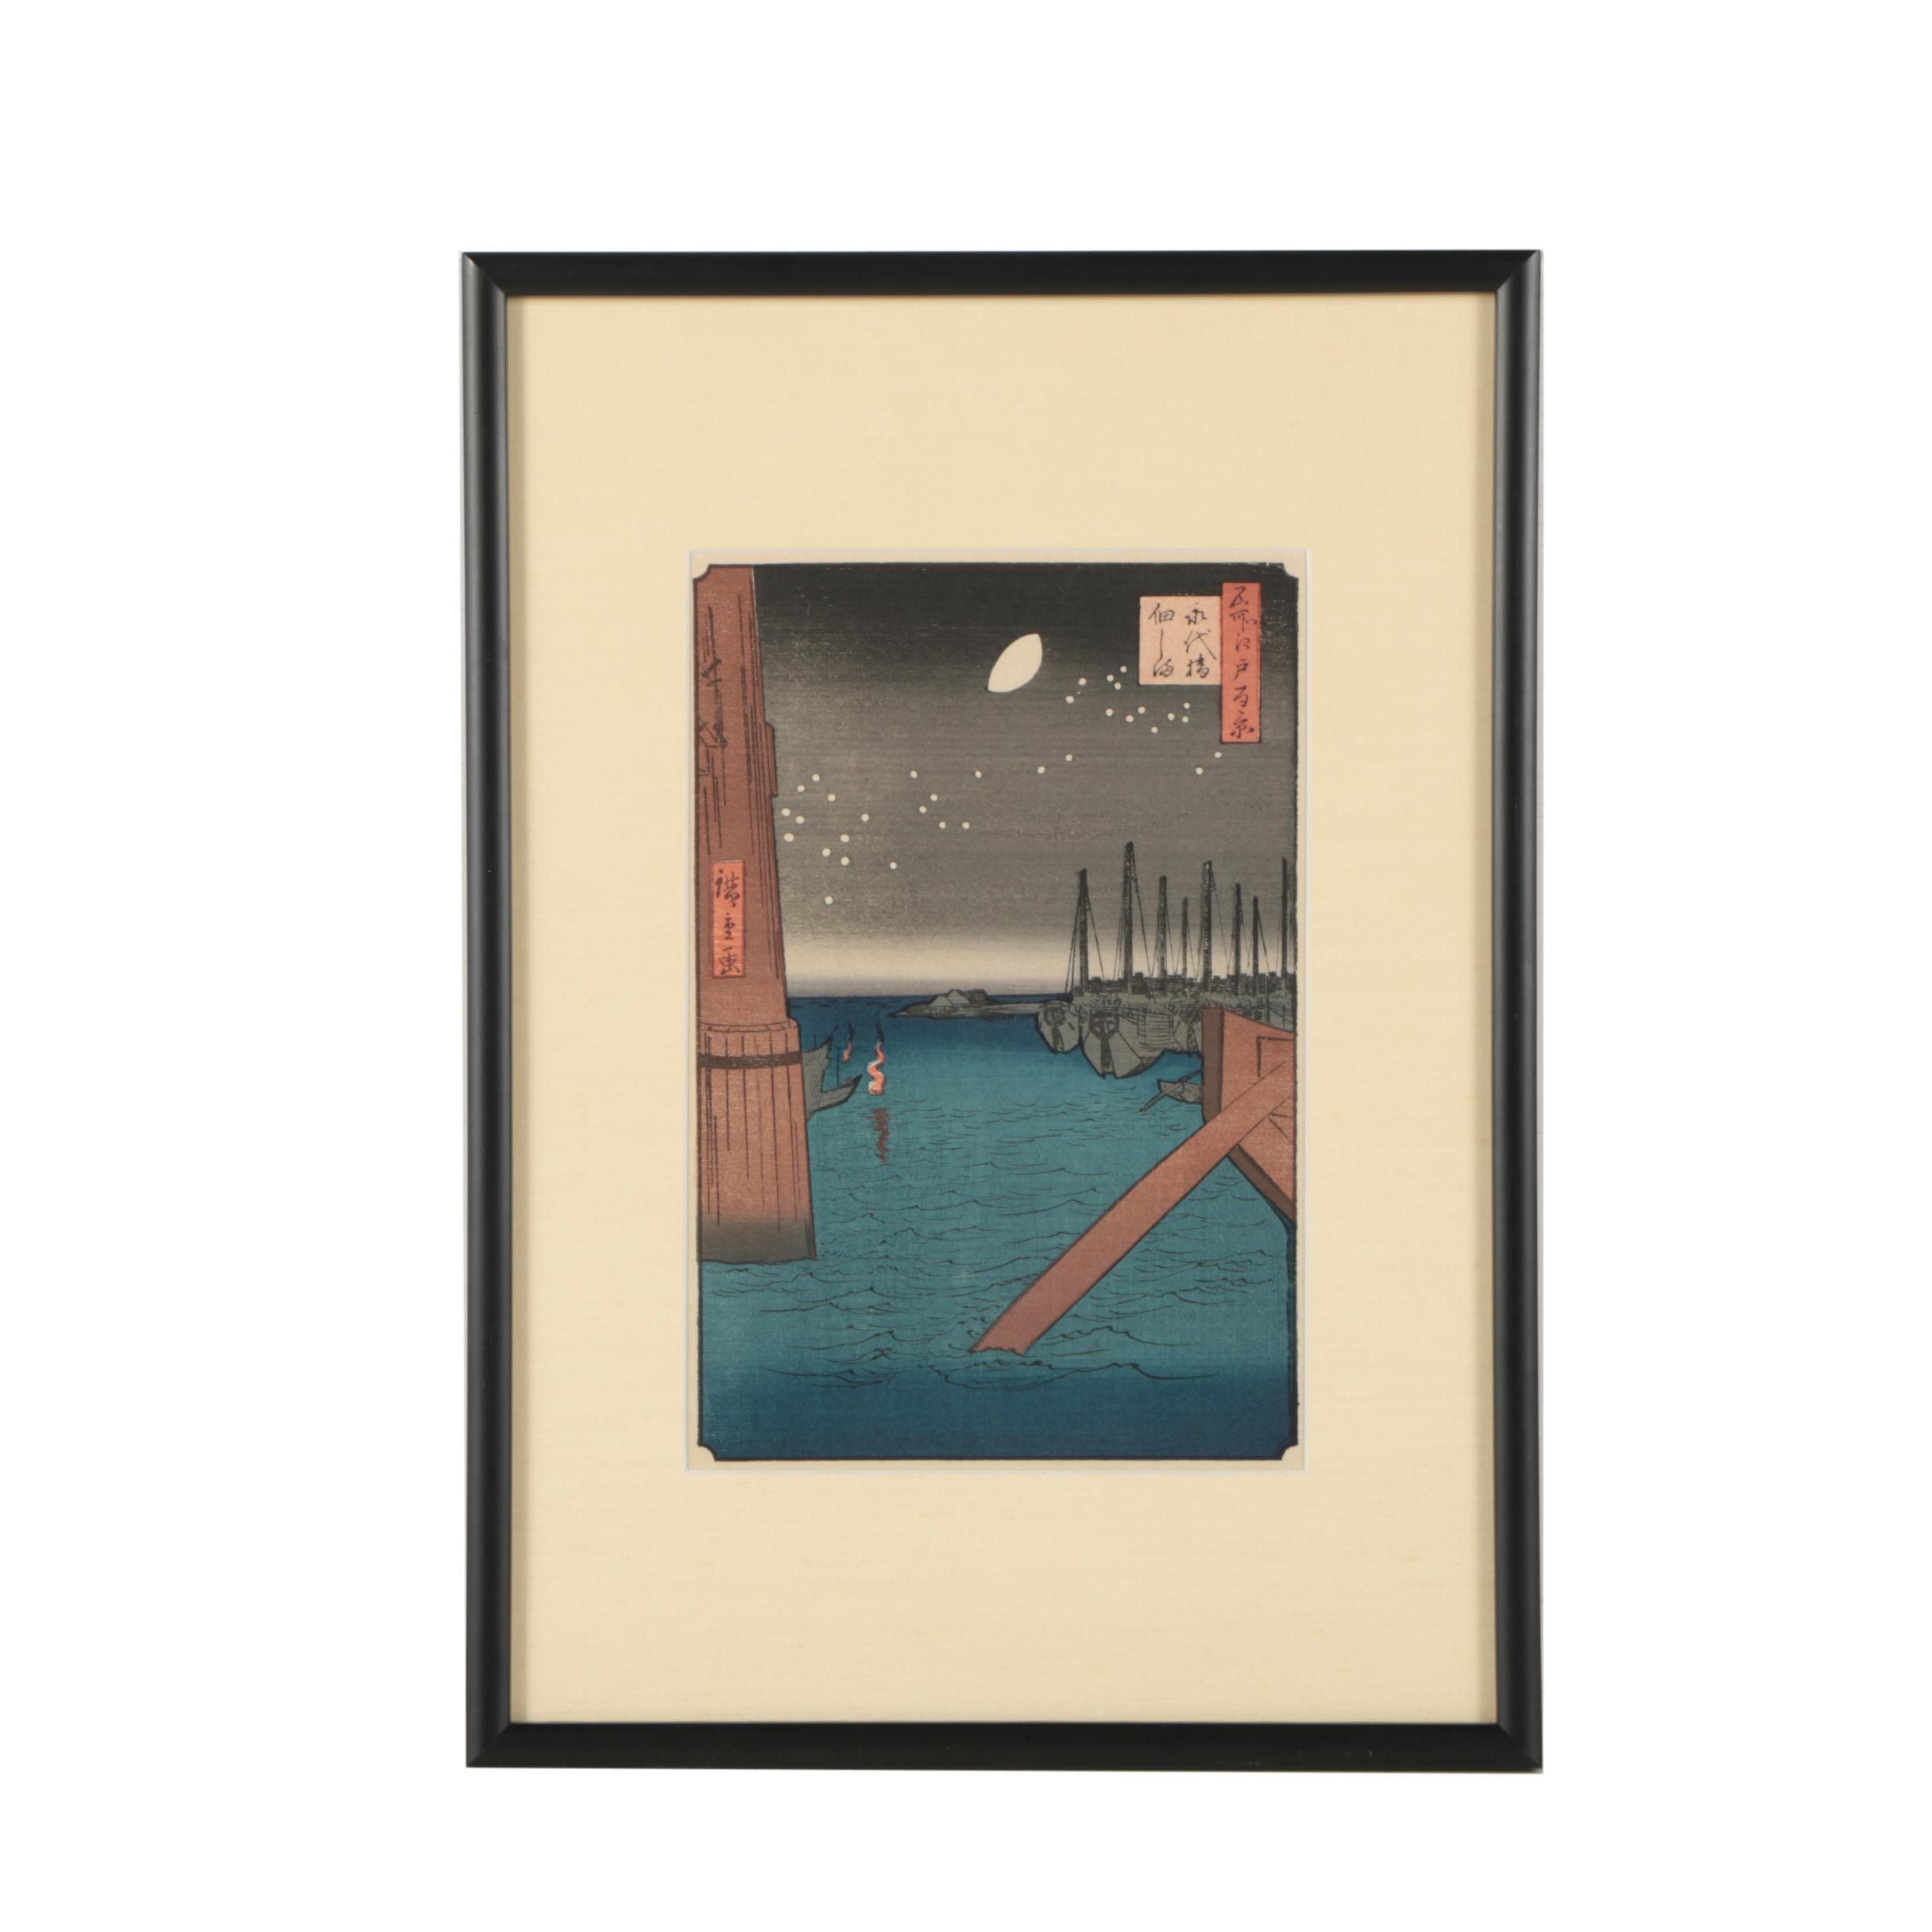 "Woodblock After Utagawa Hiroshige's ""Tsukudajima from Eitai Bridge"""